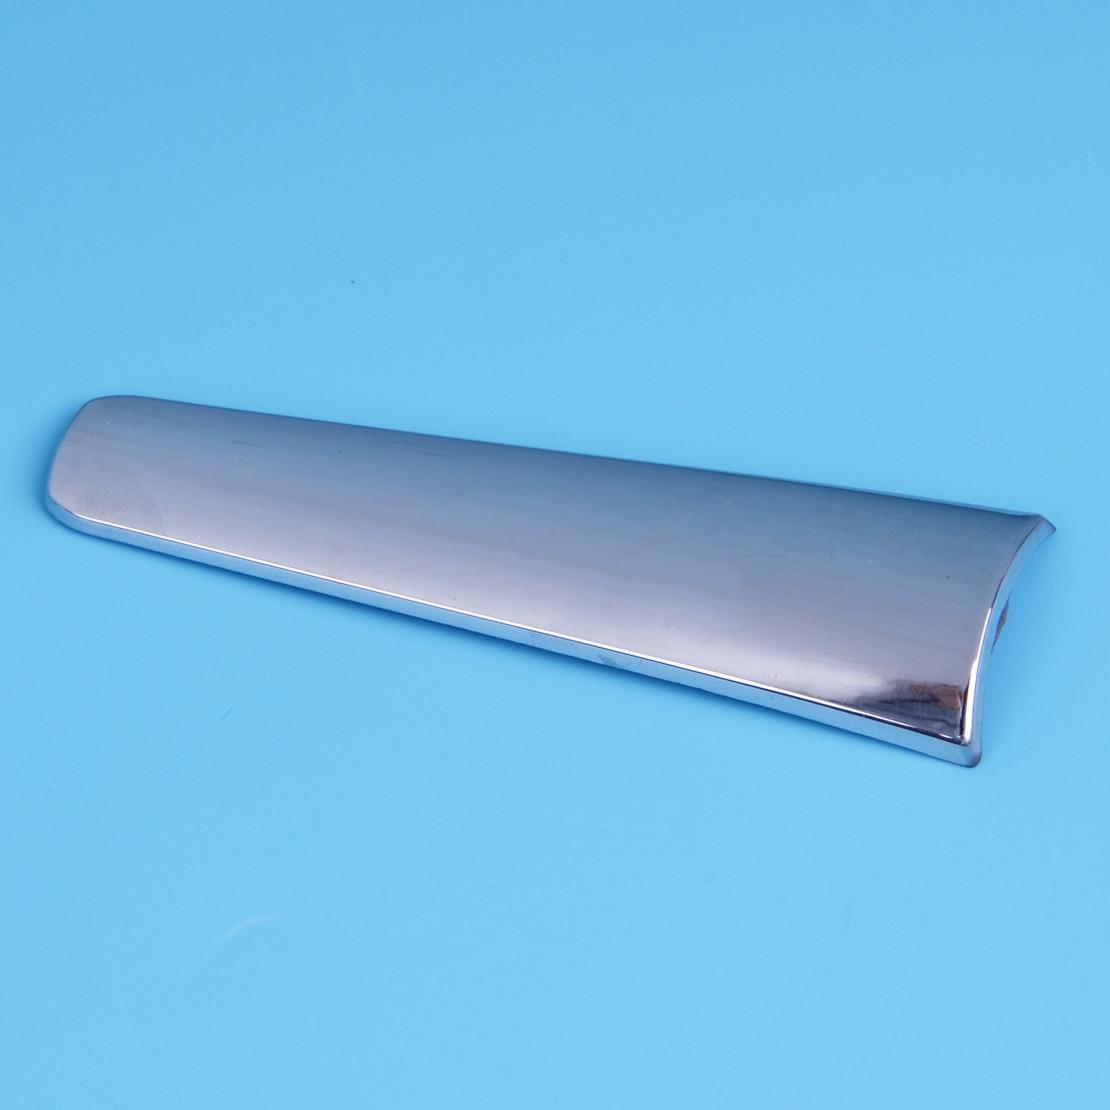 4x DENSO SK20R11 Iridium Spark Plugs per Skoda Fabia 1.4 16V 04.06-12.07